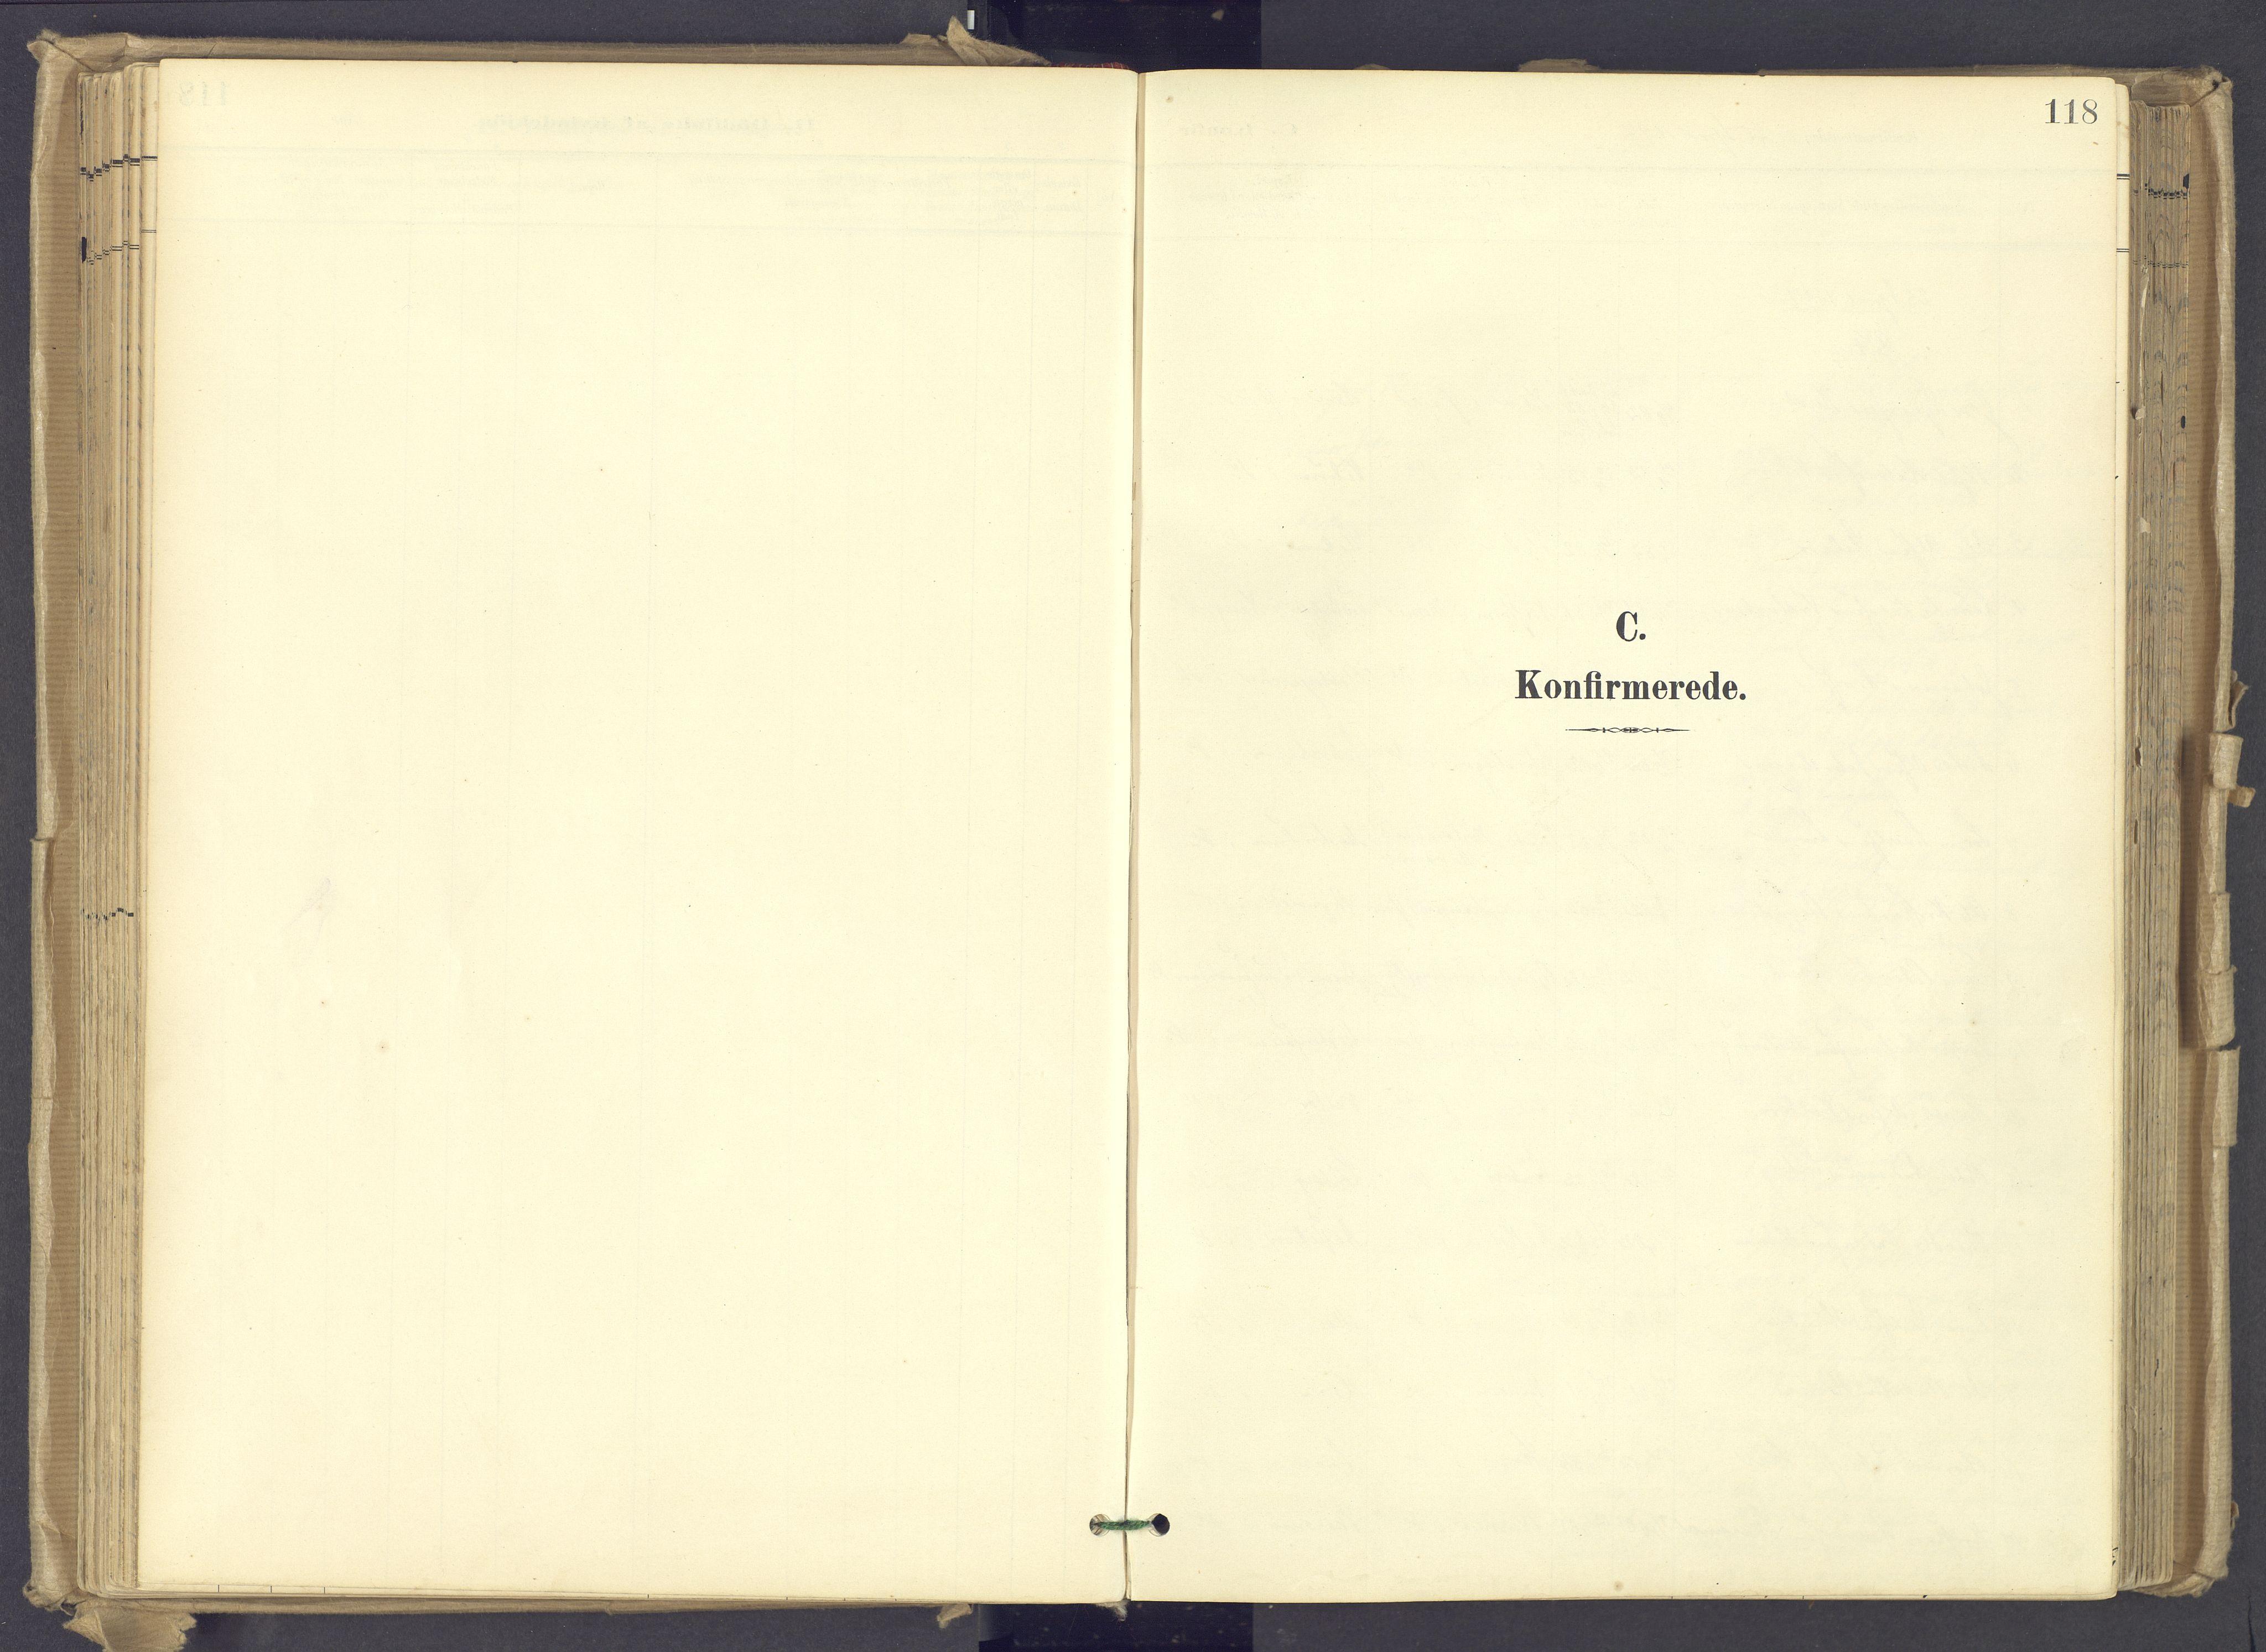 SAH, Øyer prestekontor, Ministerialbok nr. 12, 1897-1920, s. 118